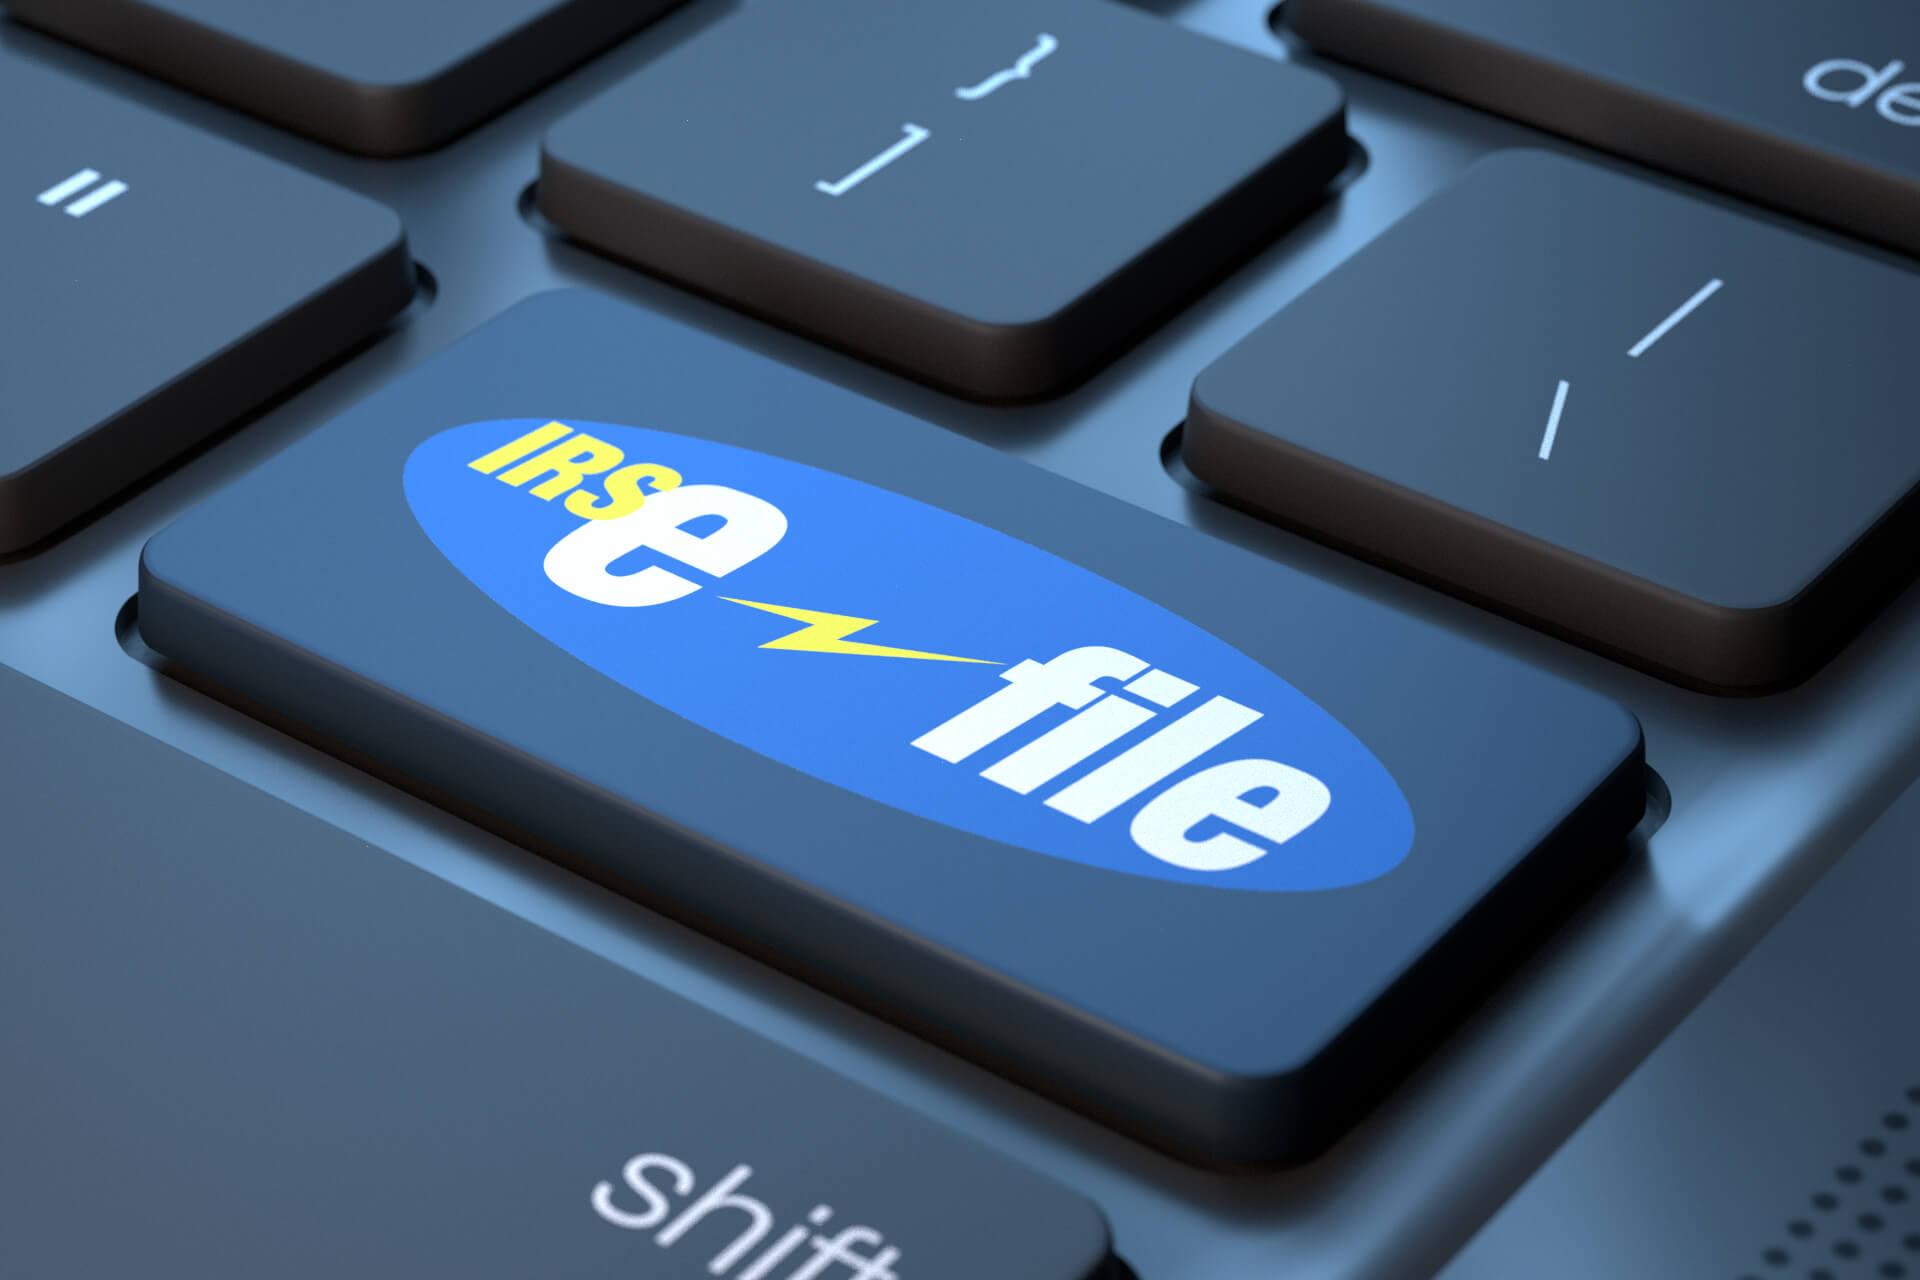 IRS e-file keyboard key free image download